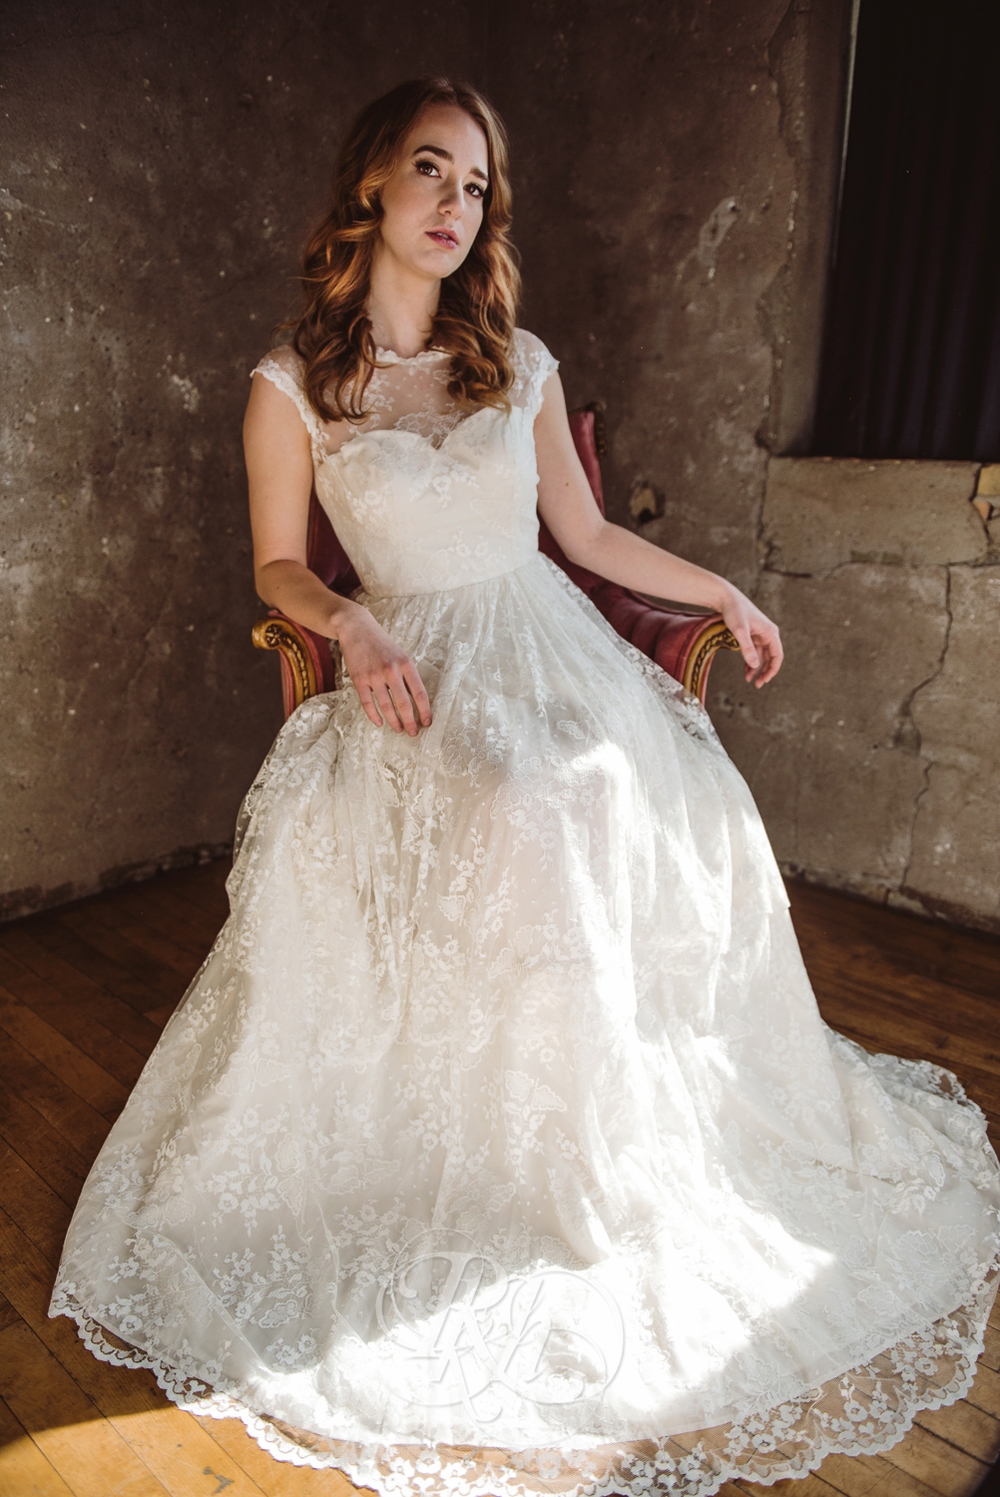 Minneapolis Wedding Shoot - RKH Images - Minnesota Wedding Photographer - Samples-14